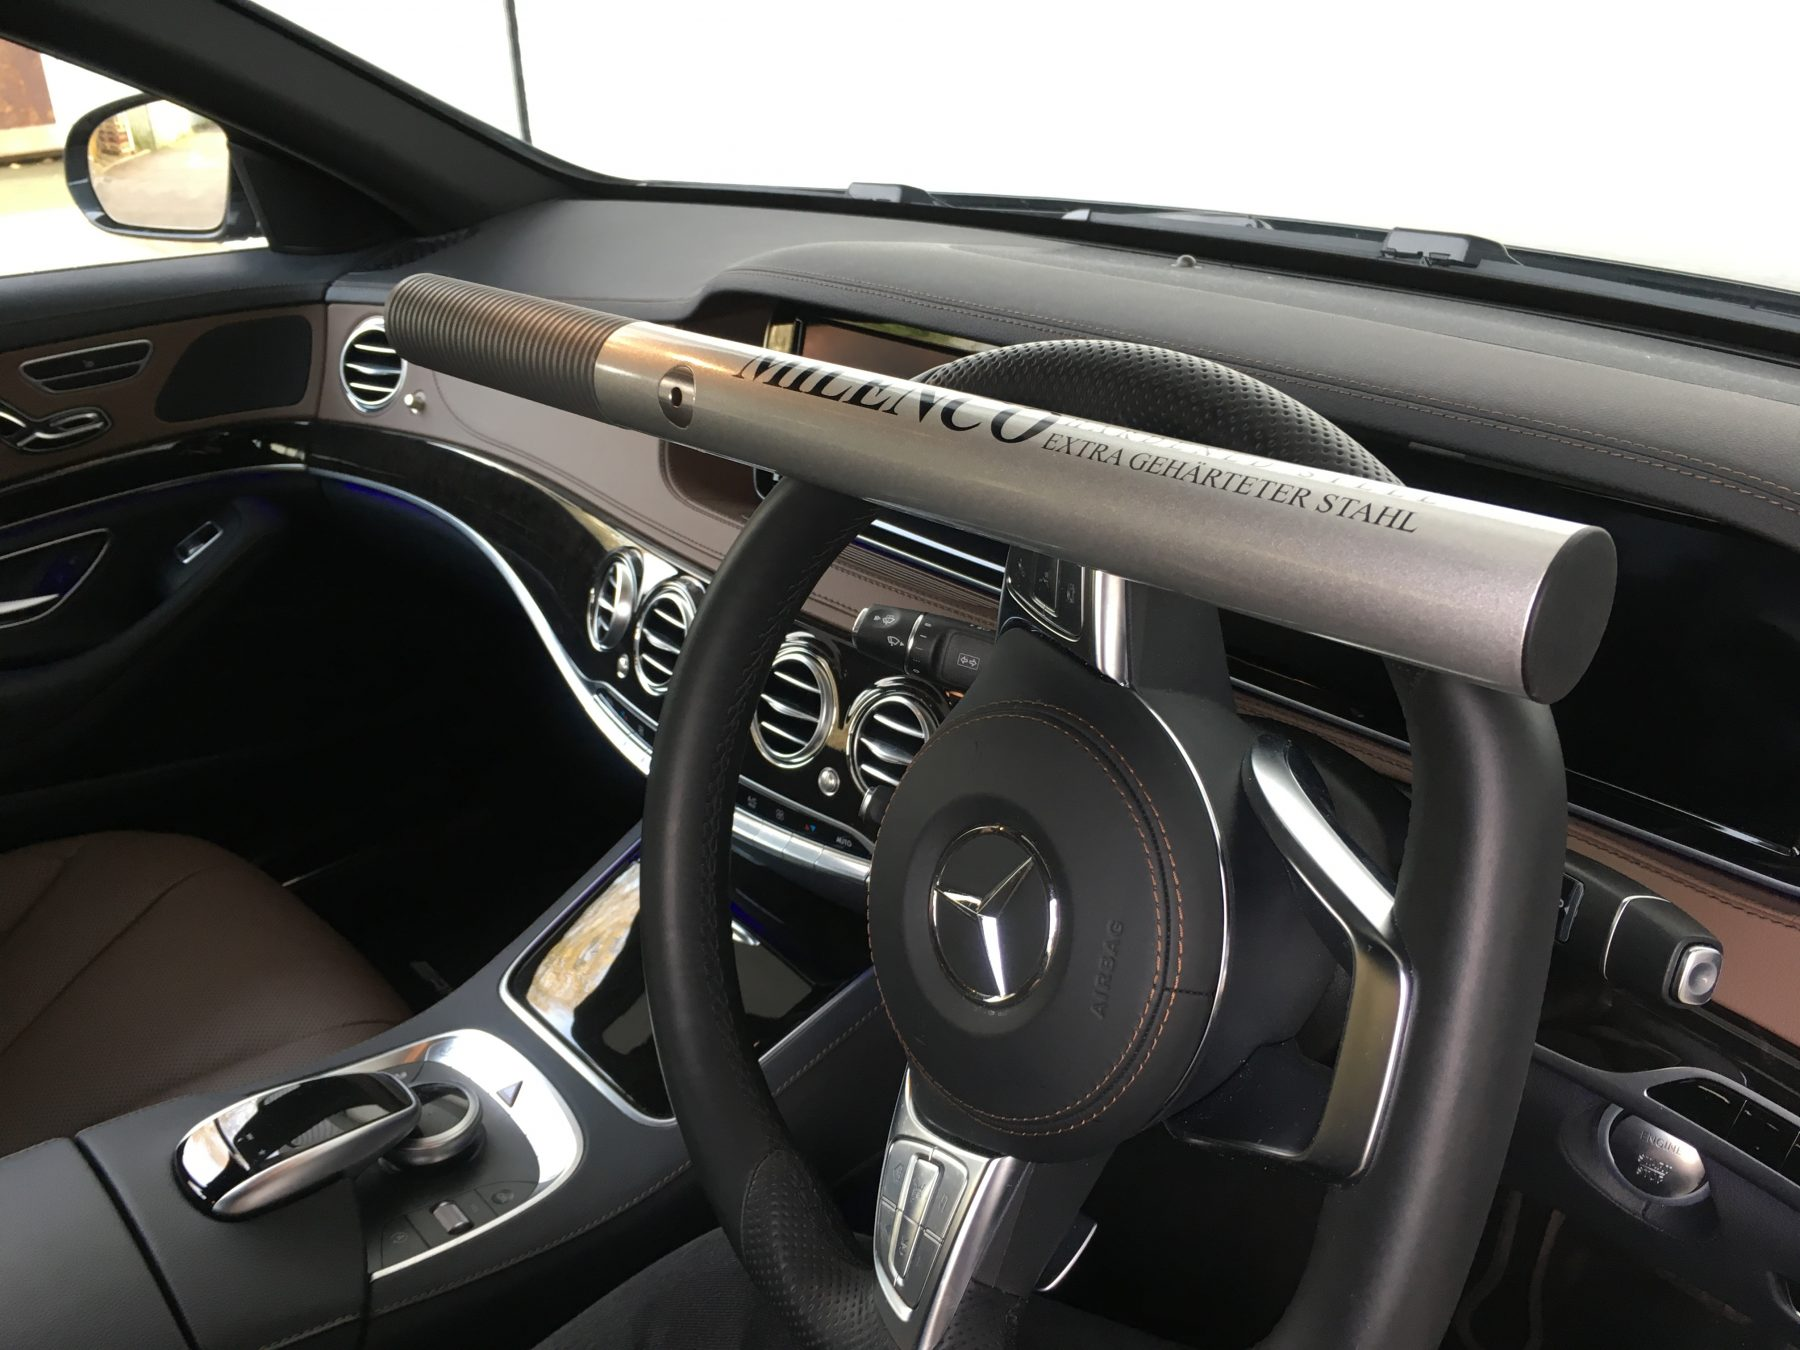 How To Unlock Steering Wheel >> High Security Steering Wheel Lock - Milenco, Europe's leading manufacturer of award winning ...